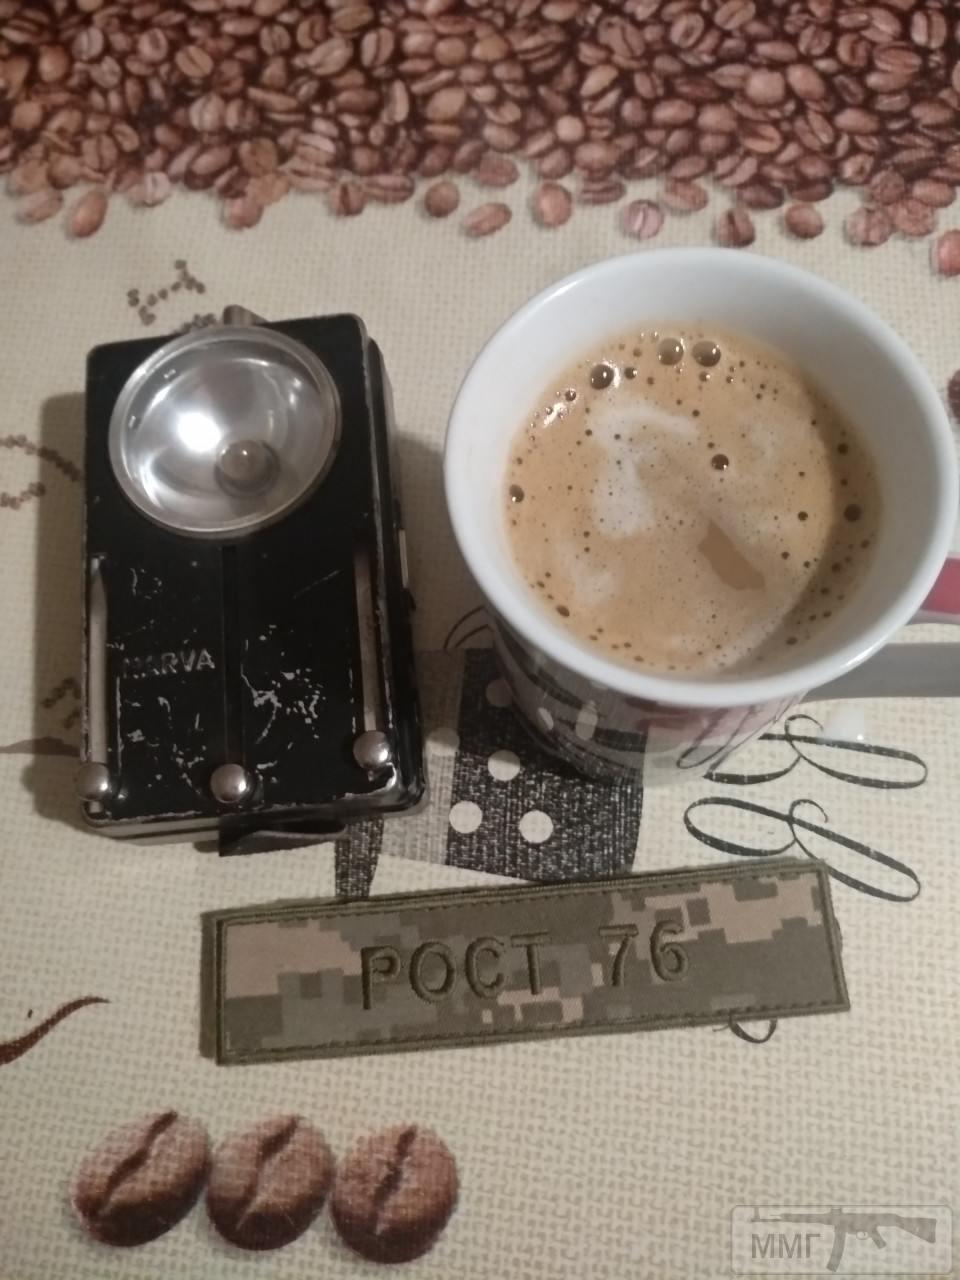 87436 - Копарські дні і будні.